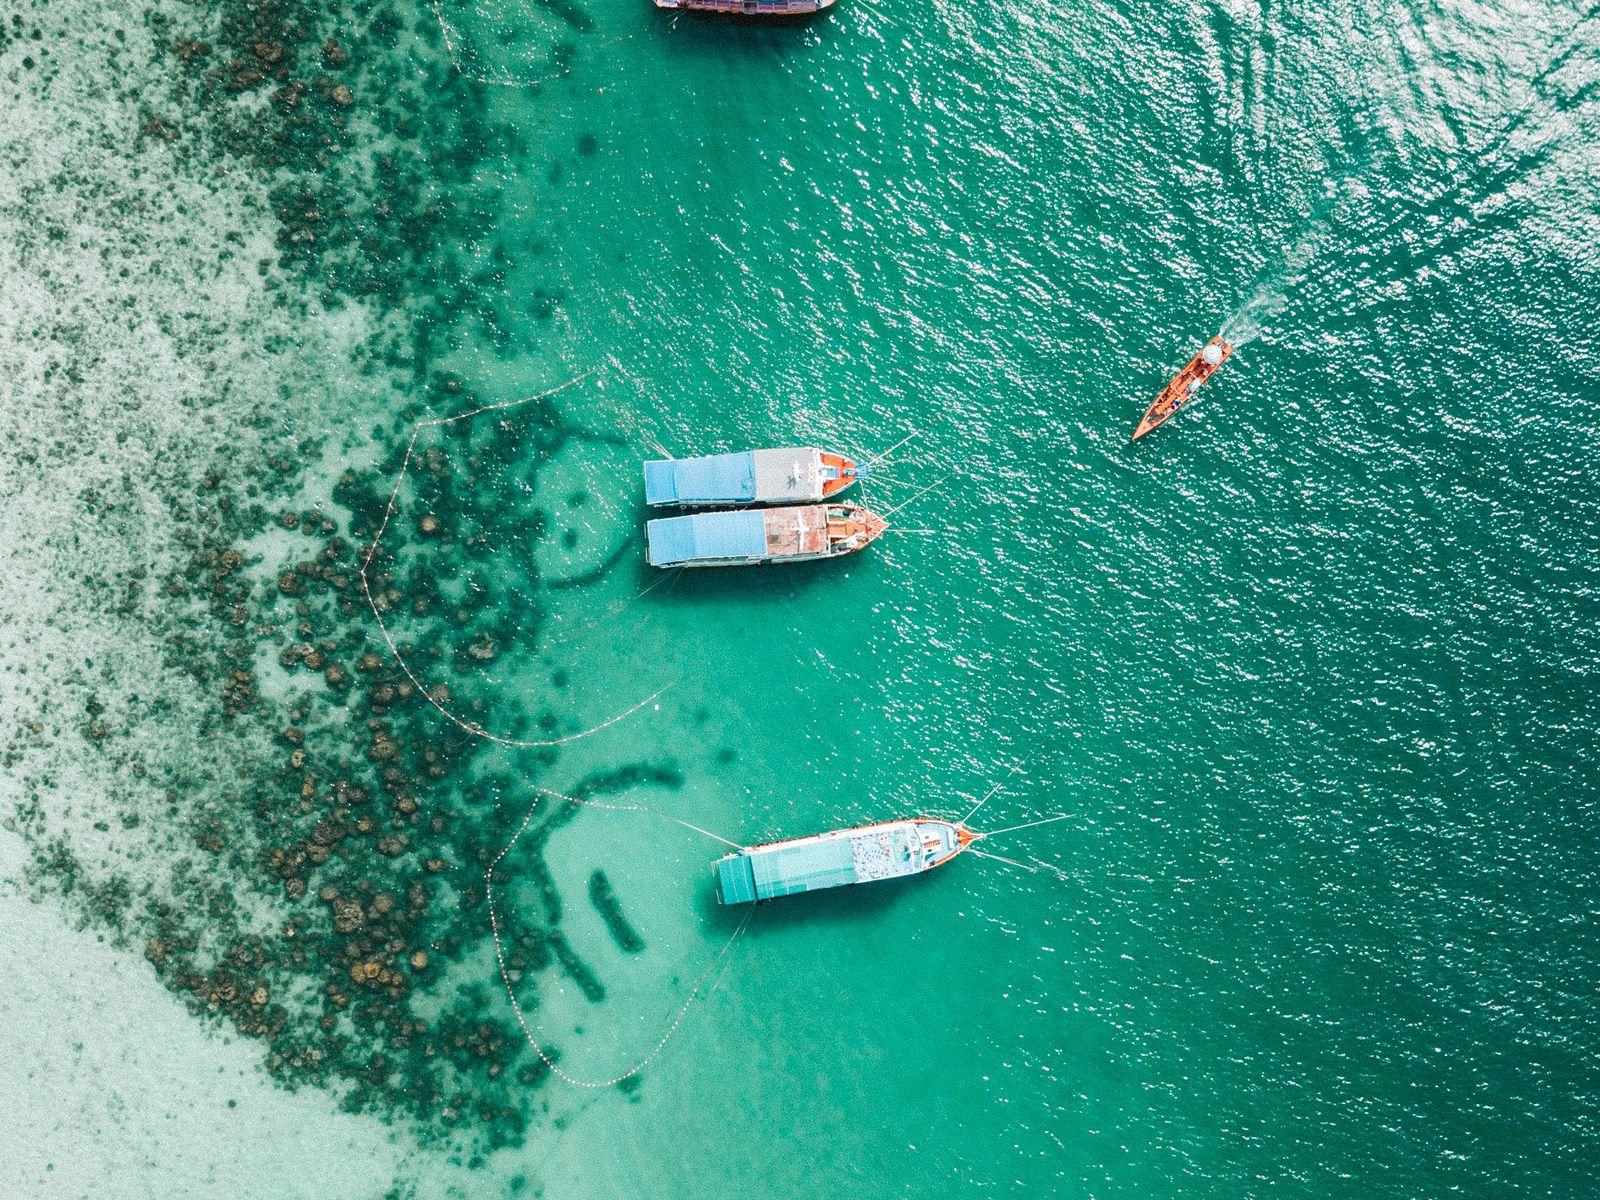 1600x1200 Wallpaper shore, boats, sandbar, ocean, moored, aerial view